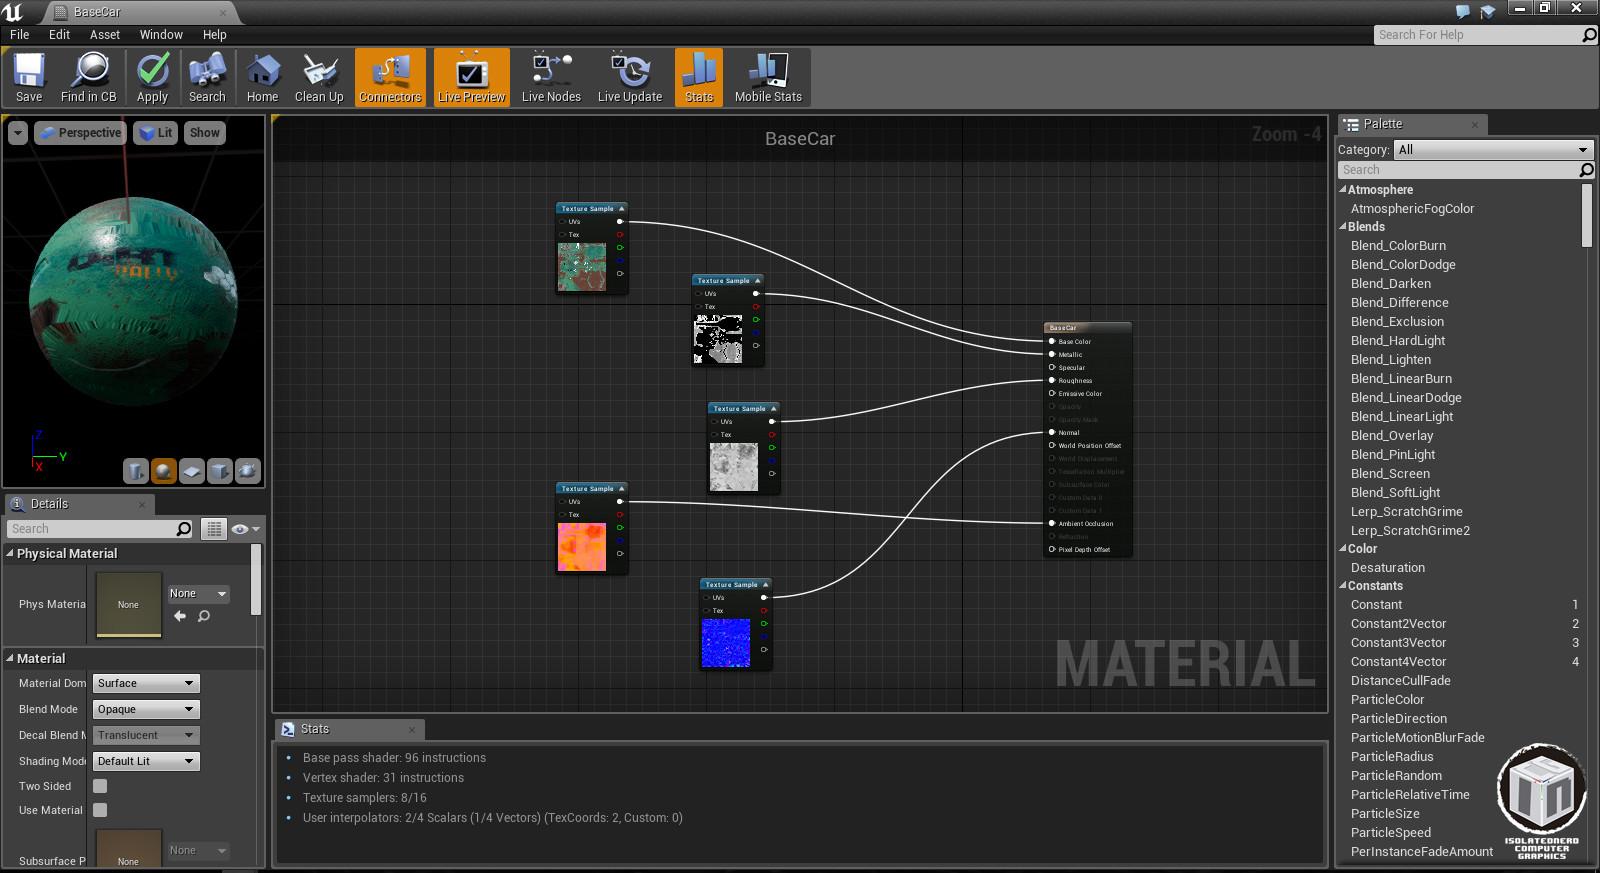 UE4 Material Editor